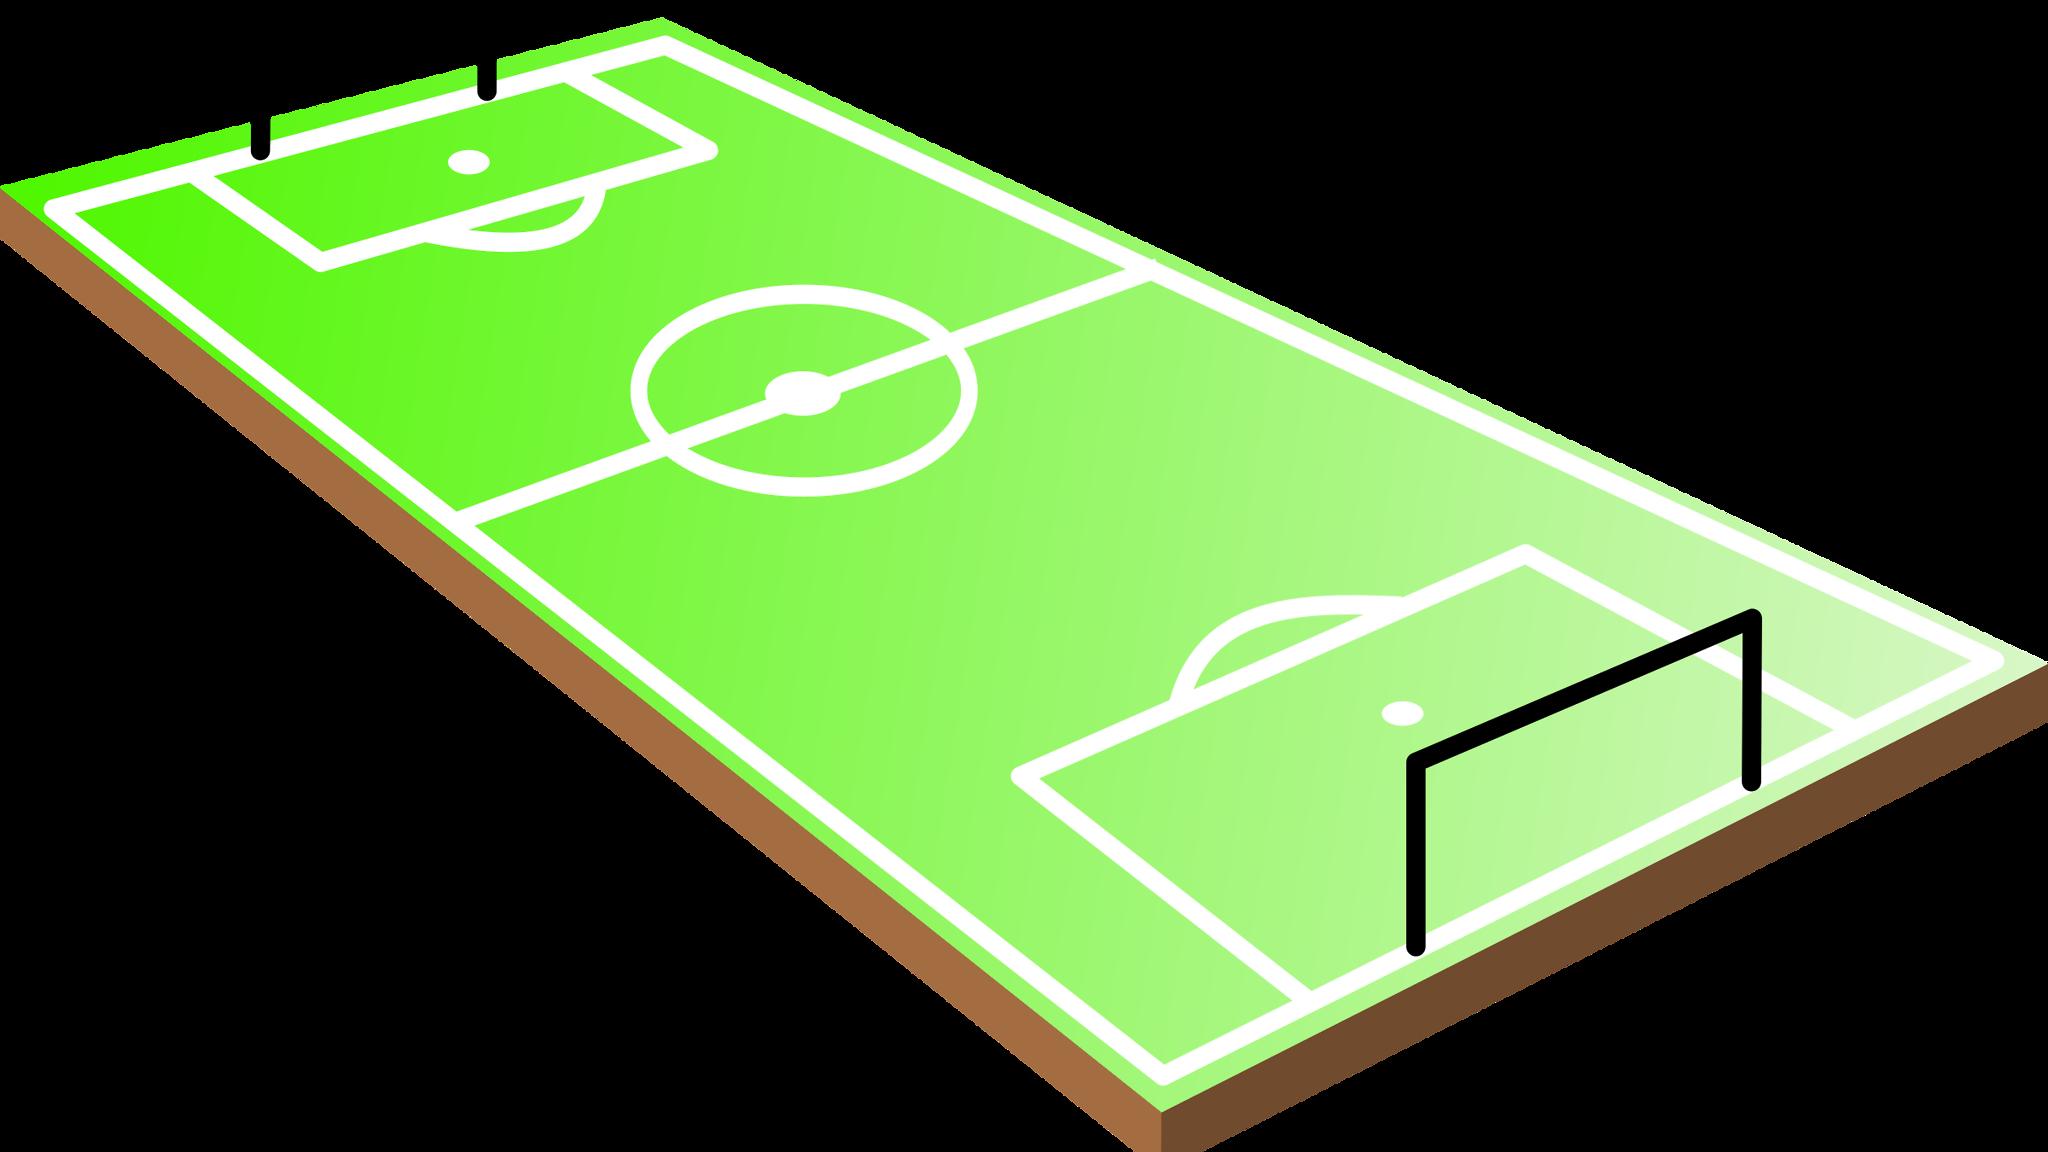 Games clipart athletics games. Football pitch field stadium